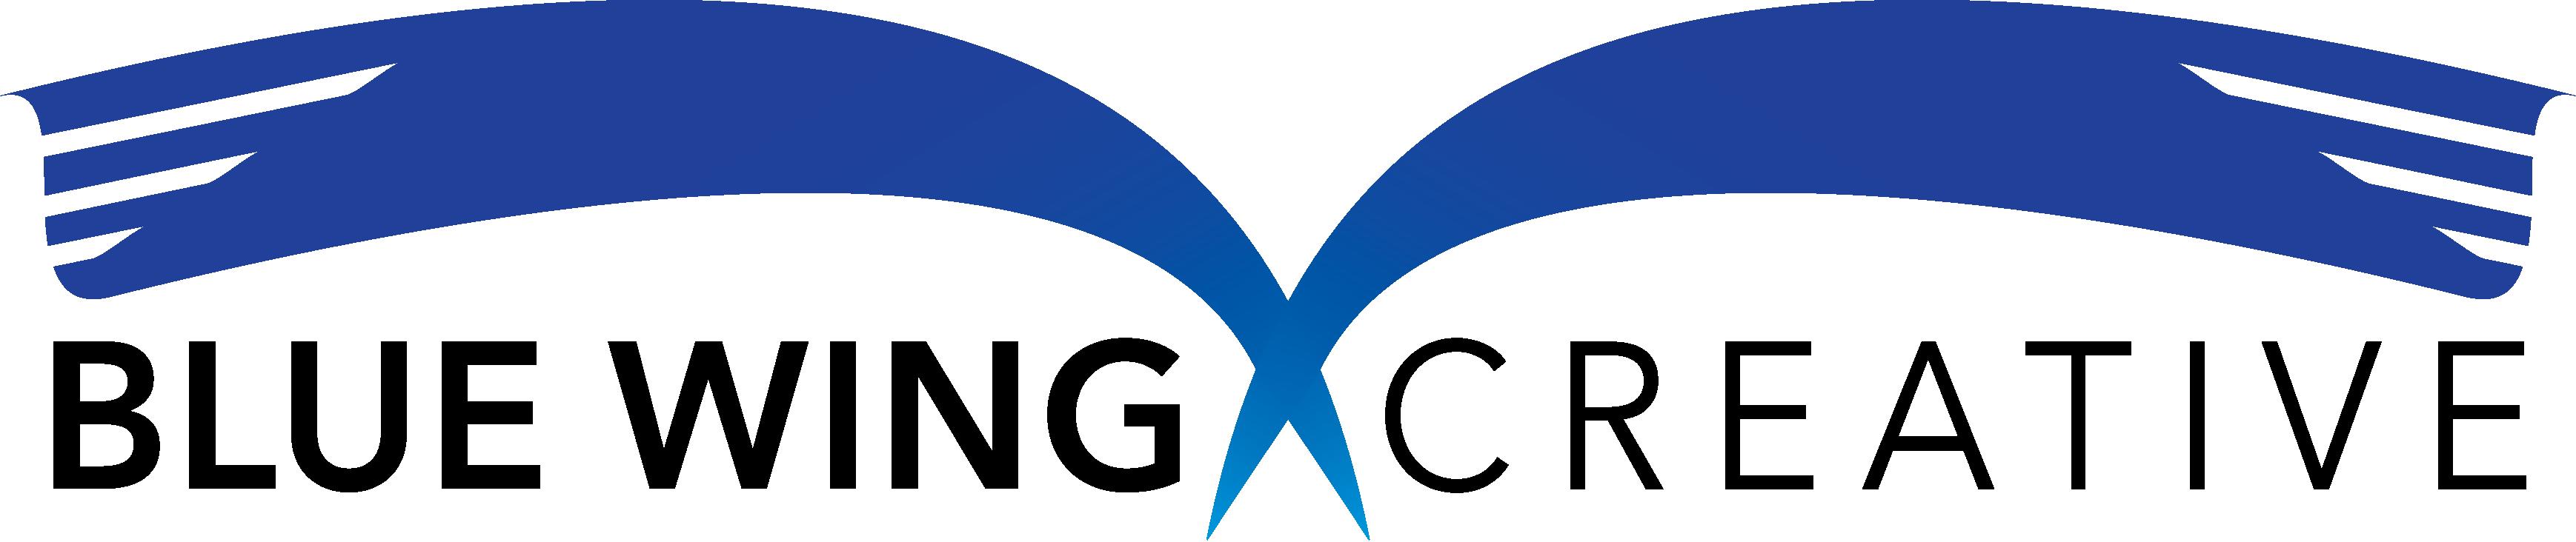 Blue Wing Creative